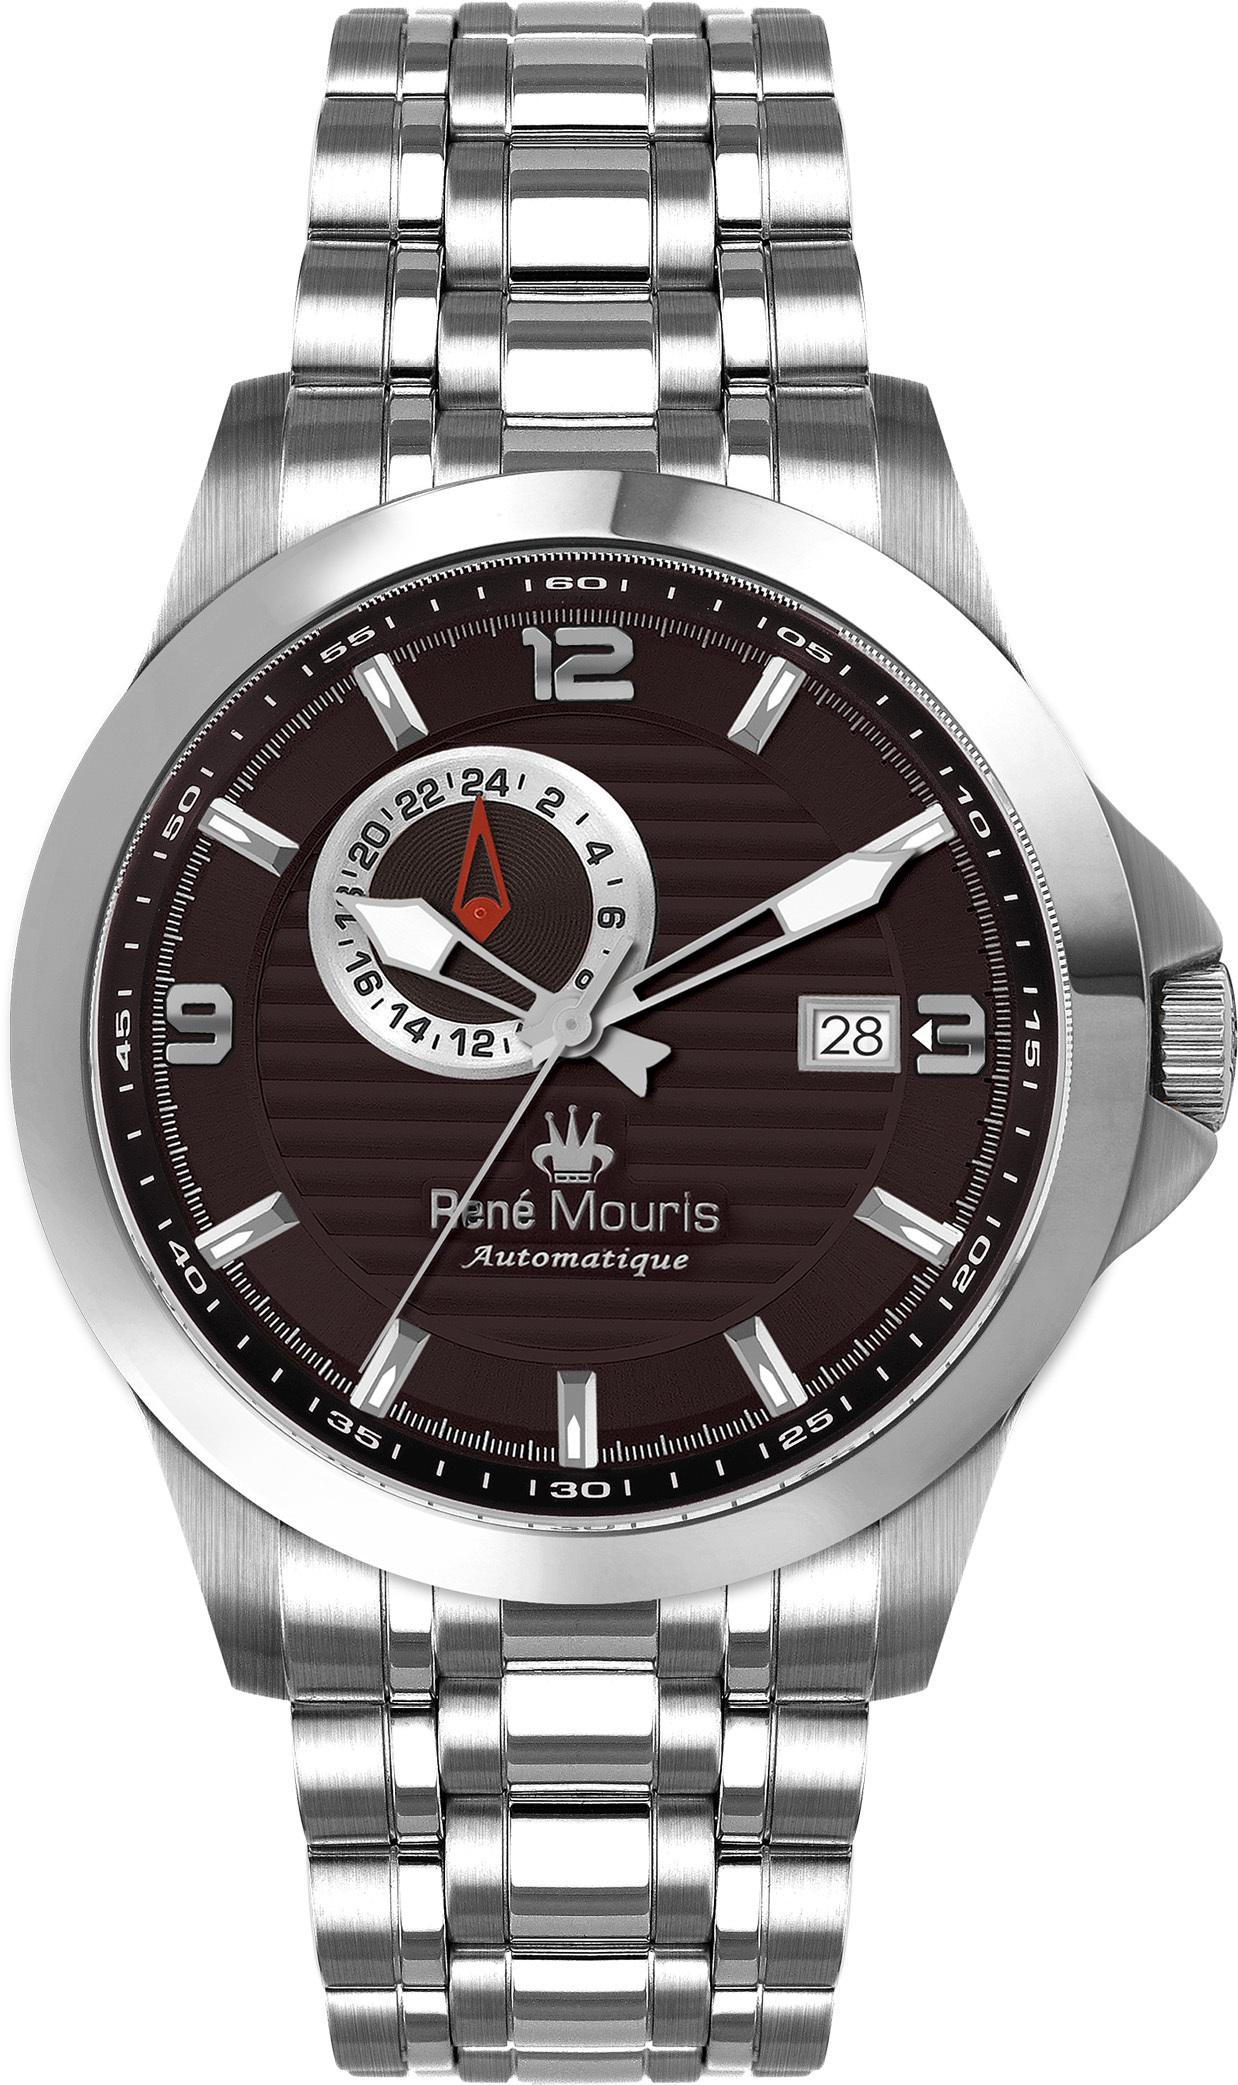 Rene Mouris Automatic Watch - Steel - Cygnus - 70104RM3